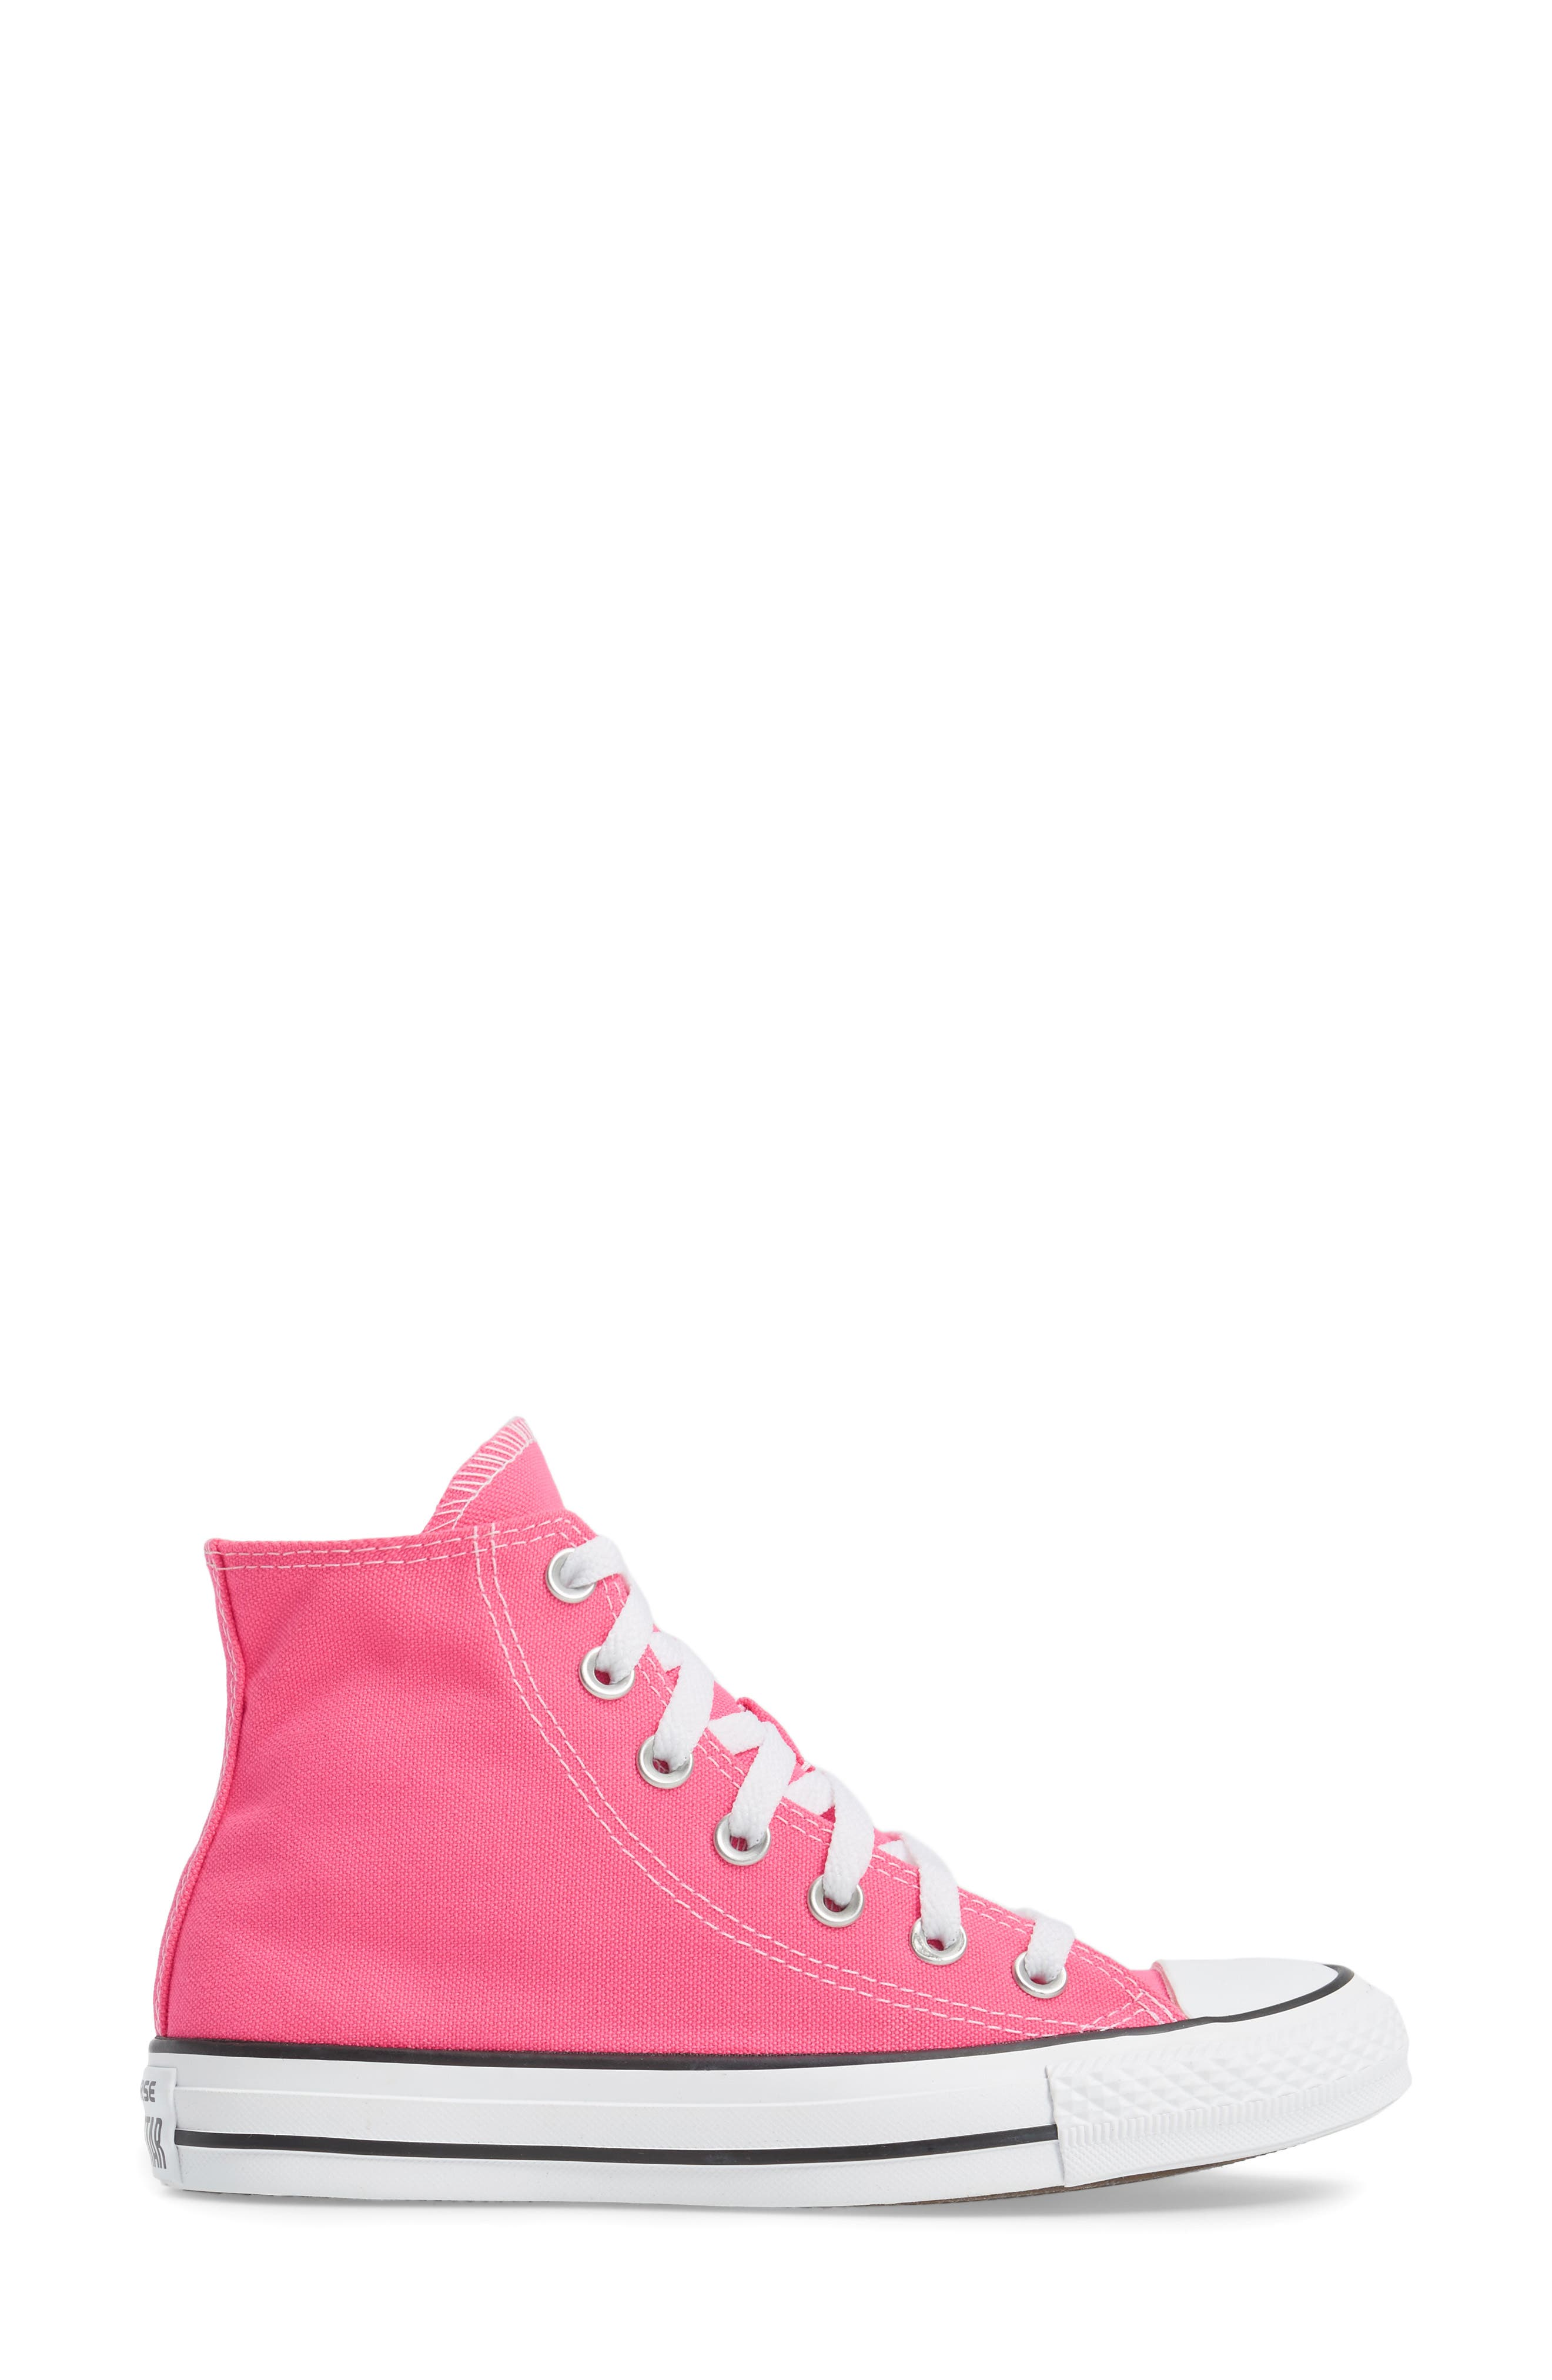 Alternate Image 3  - Converse Chuck Taylor® All Star® Seasonal Hi Sneaker (Women)